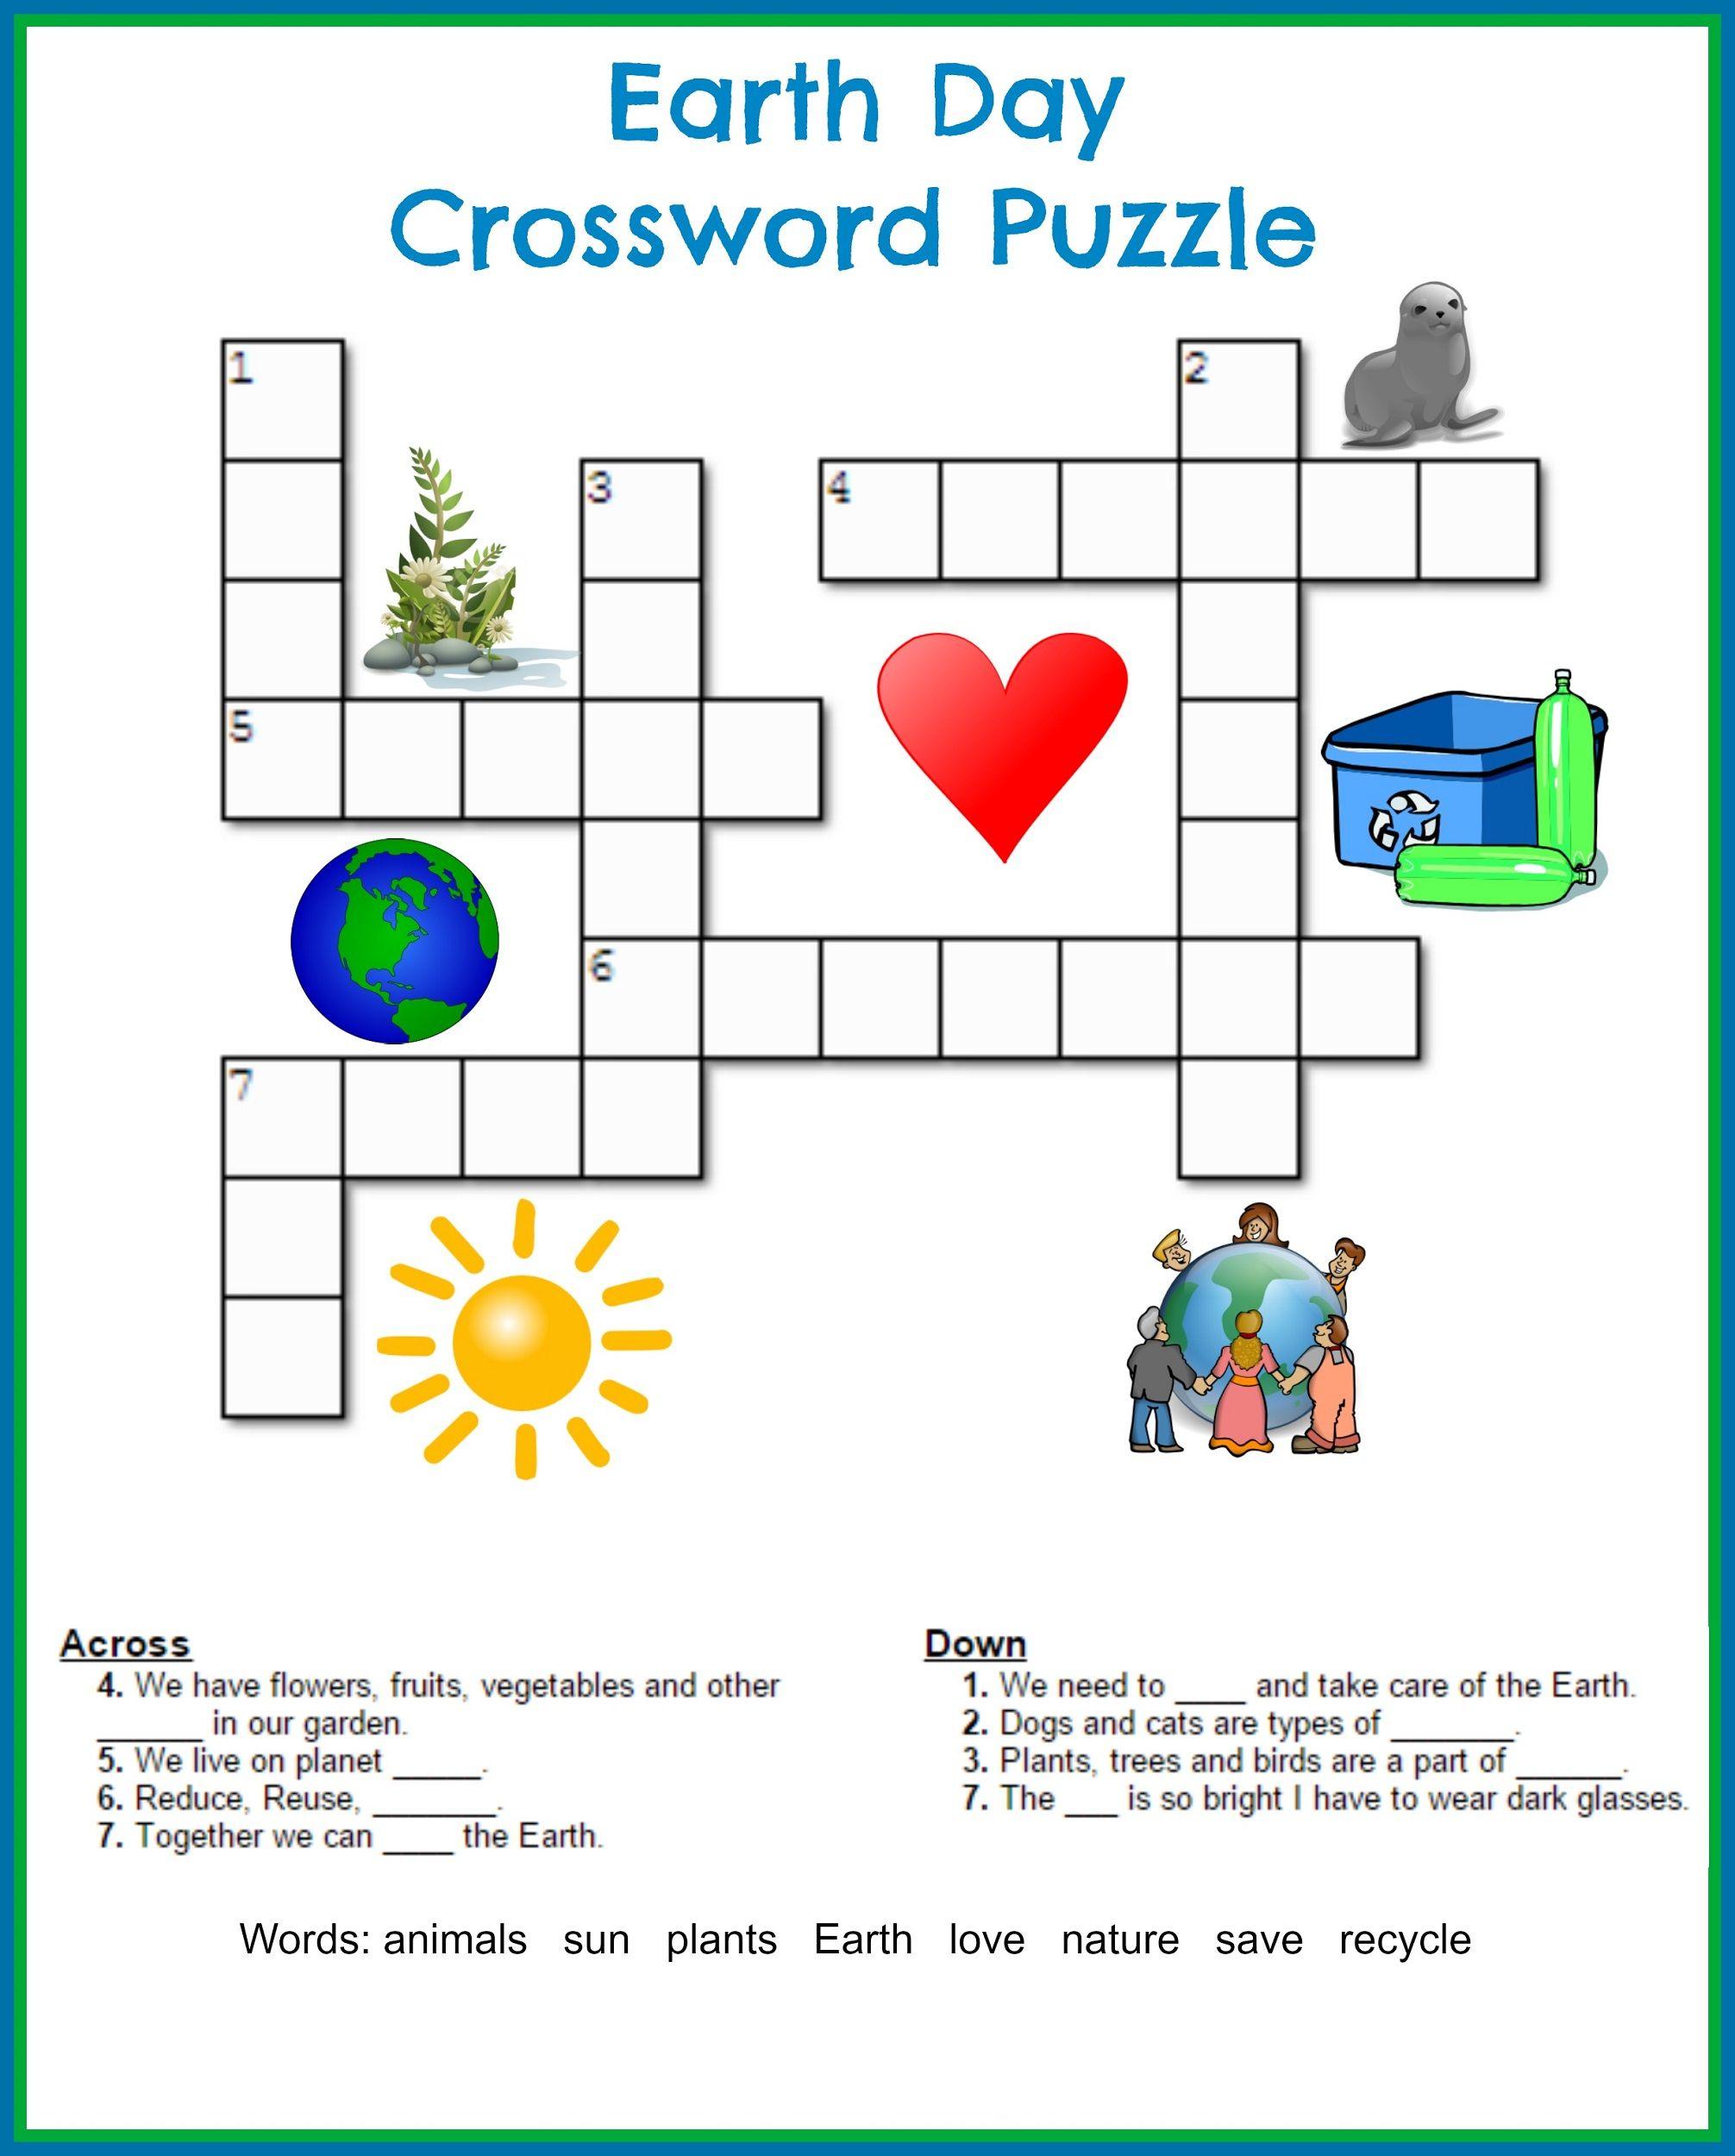 Printable Crossword Puzzles Kids   Crossword Puzzles On Earth - Printable Crossword Puzzles For 5 Year Olds